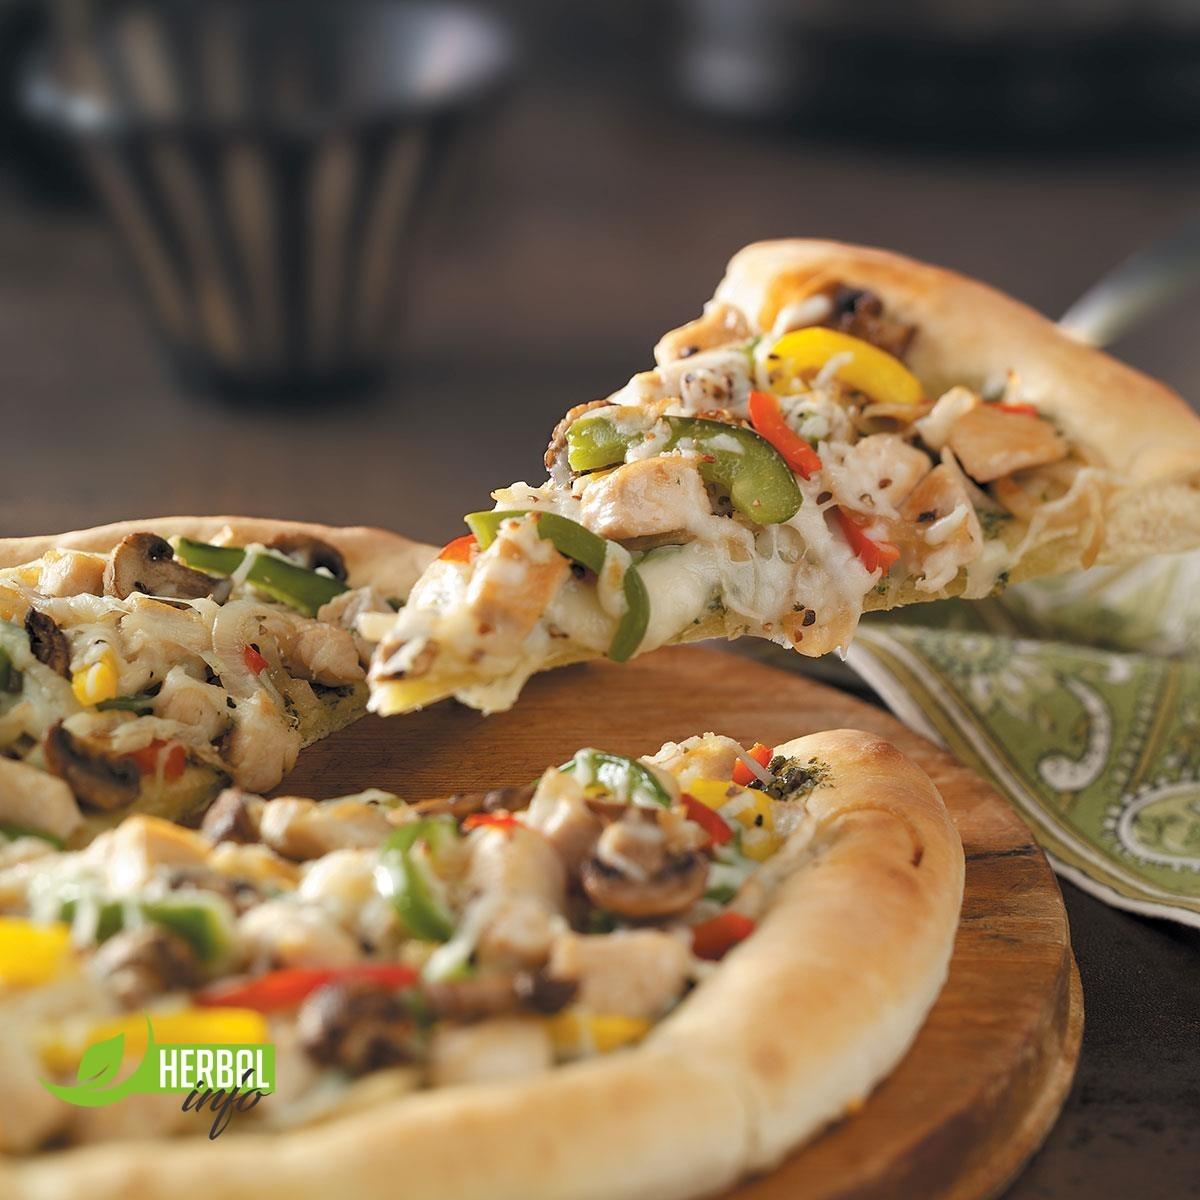 нп гербалайф рецепты пицца с курицей